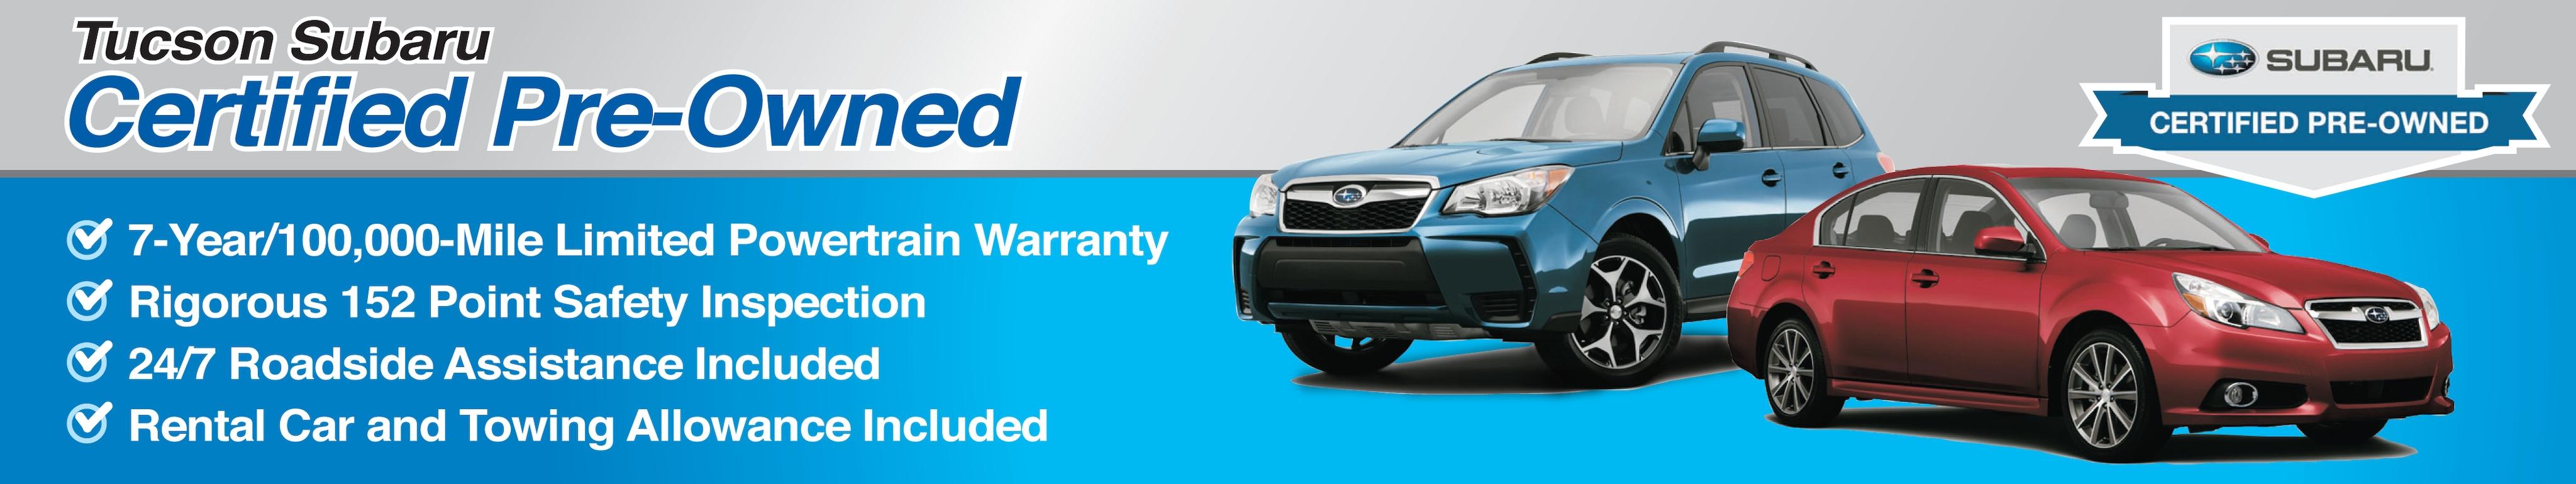 Certified Used Subaru Cars For Sale Tucson Subaru Serving Oro